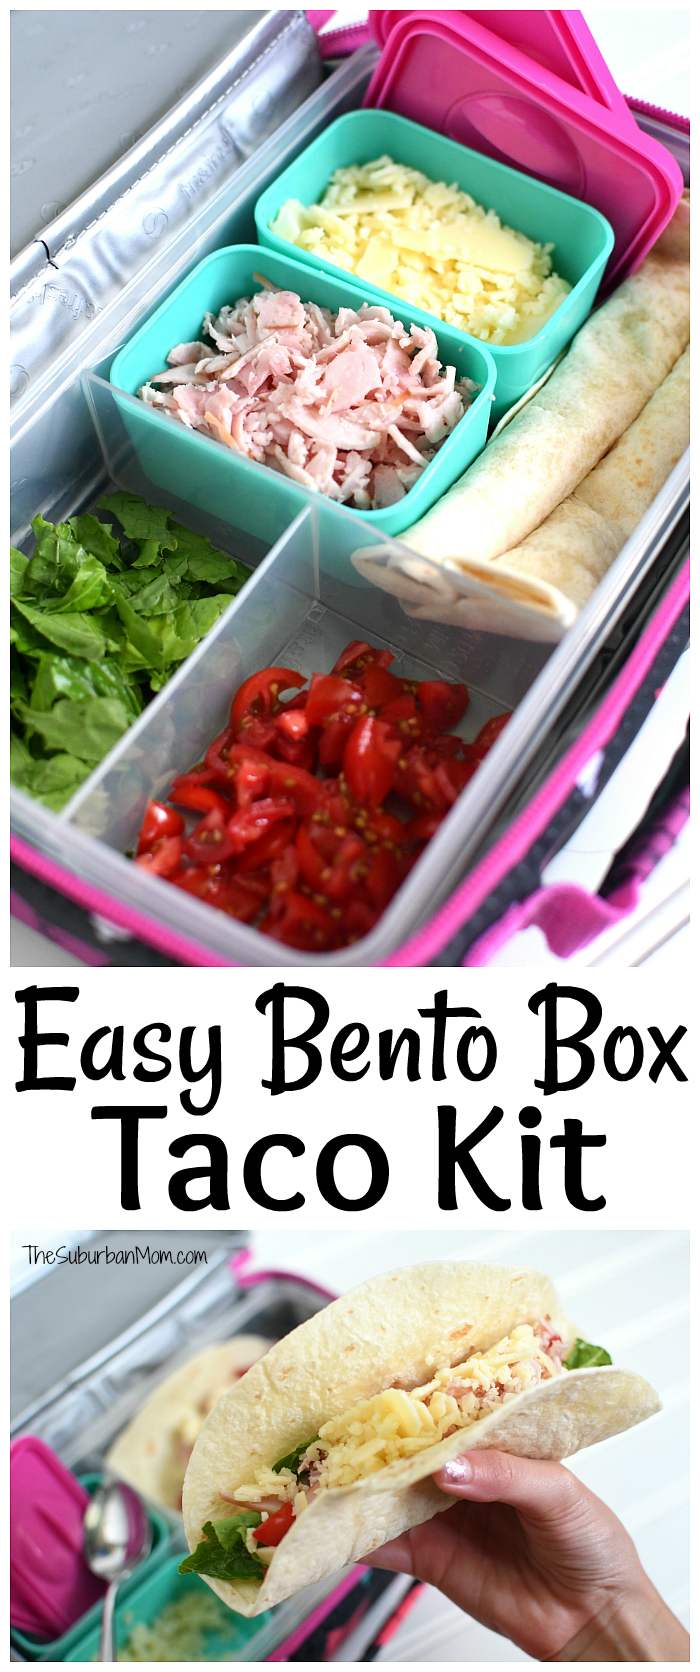 Easy Bento Box Taco Kit